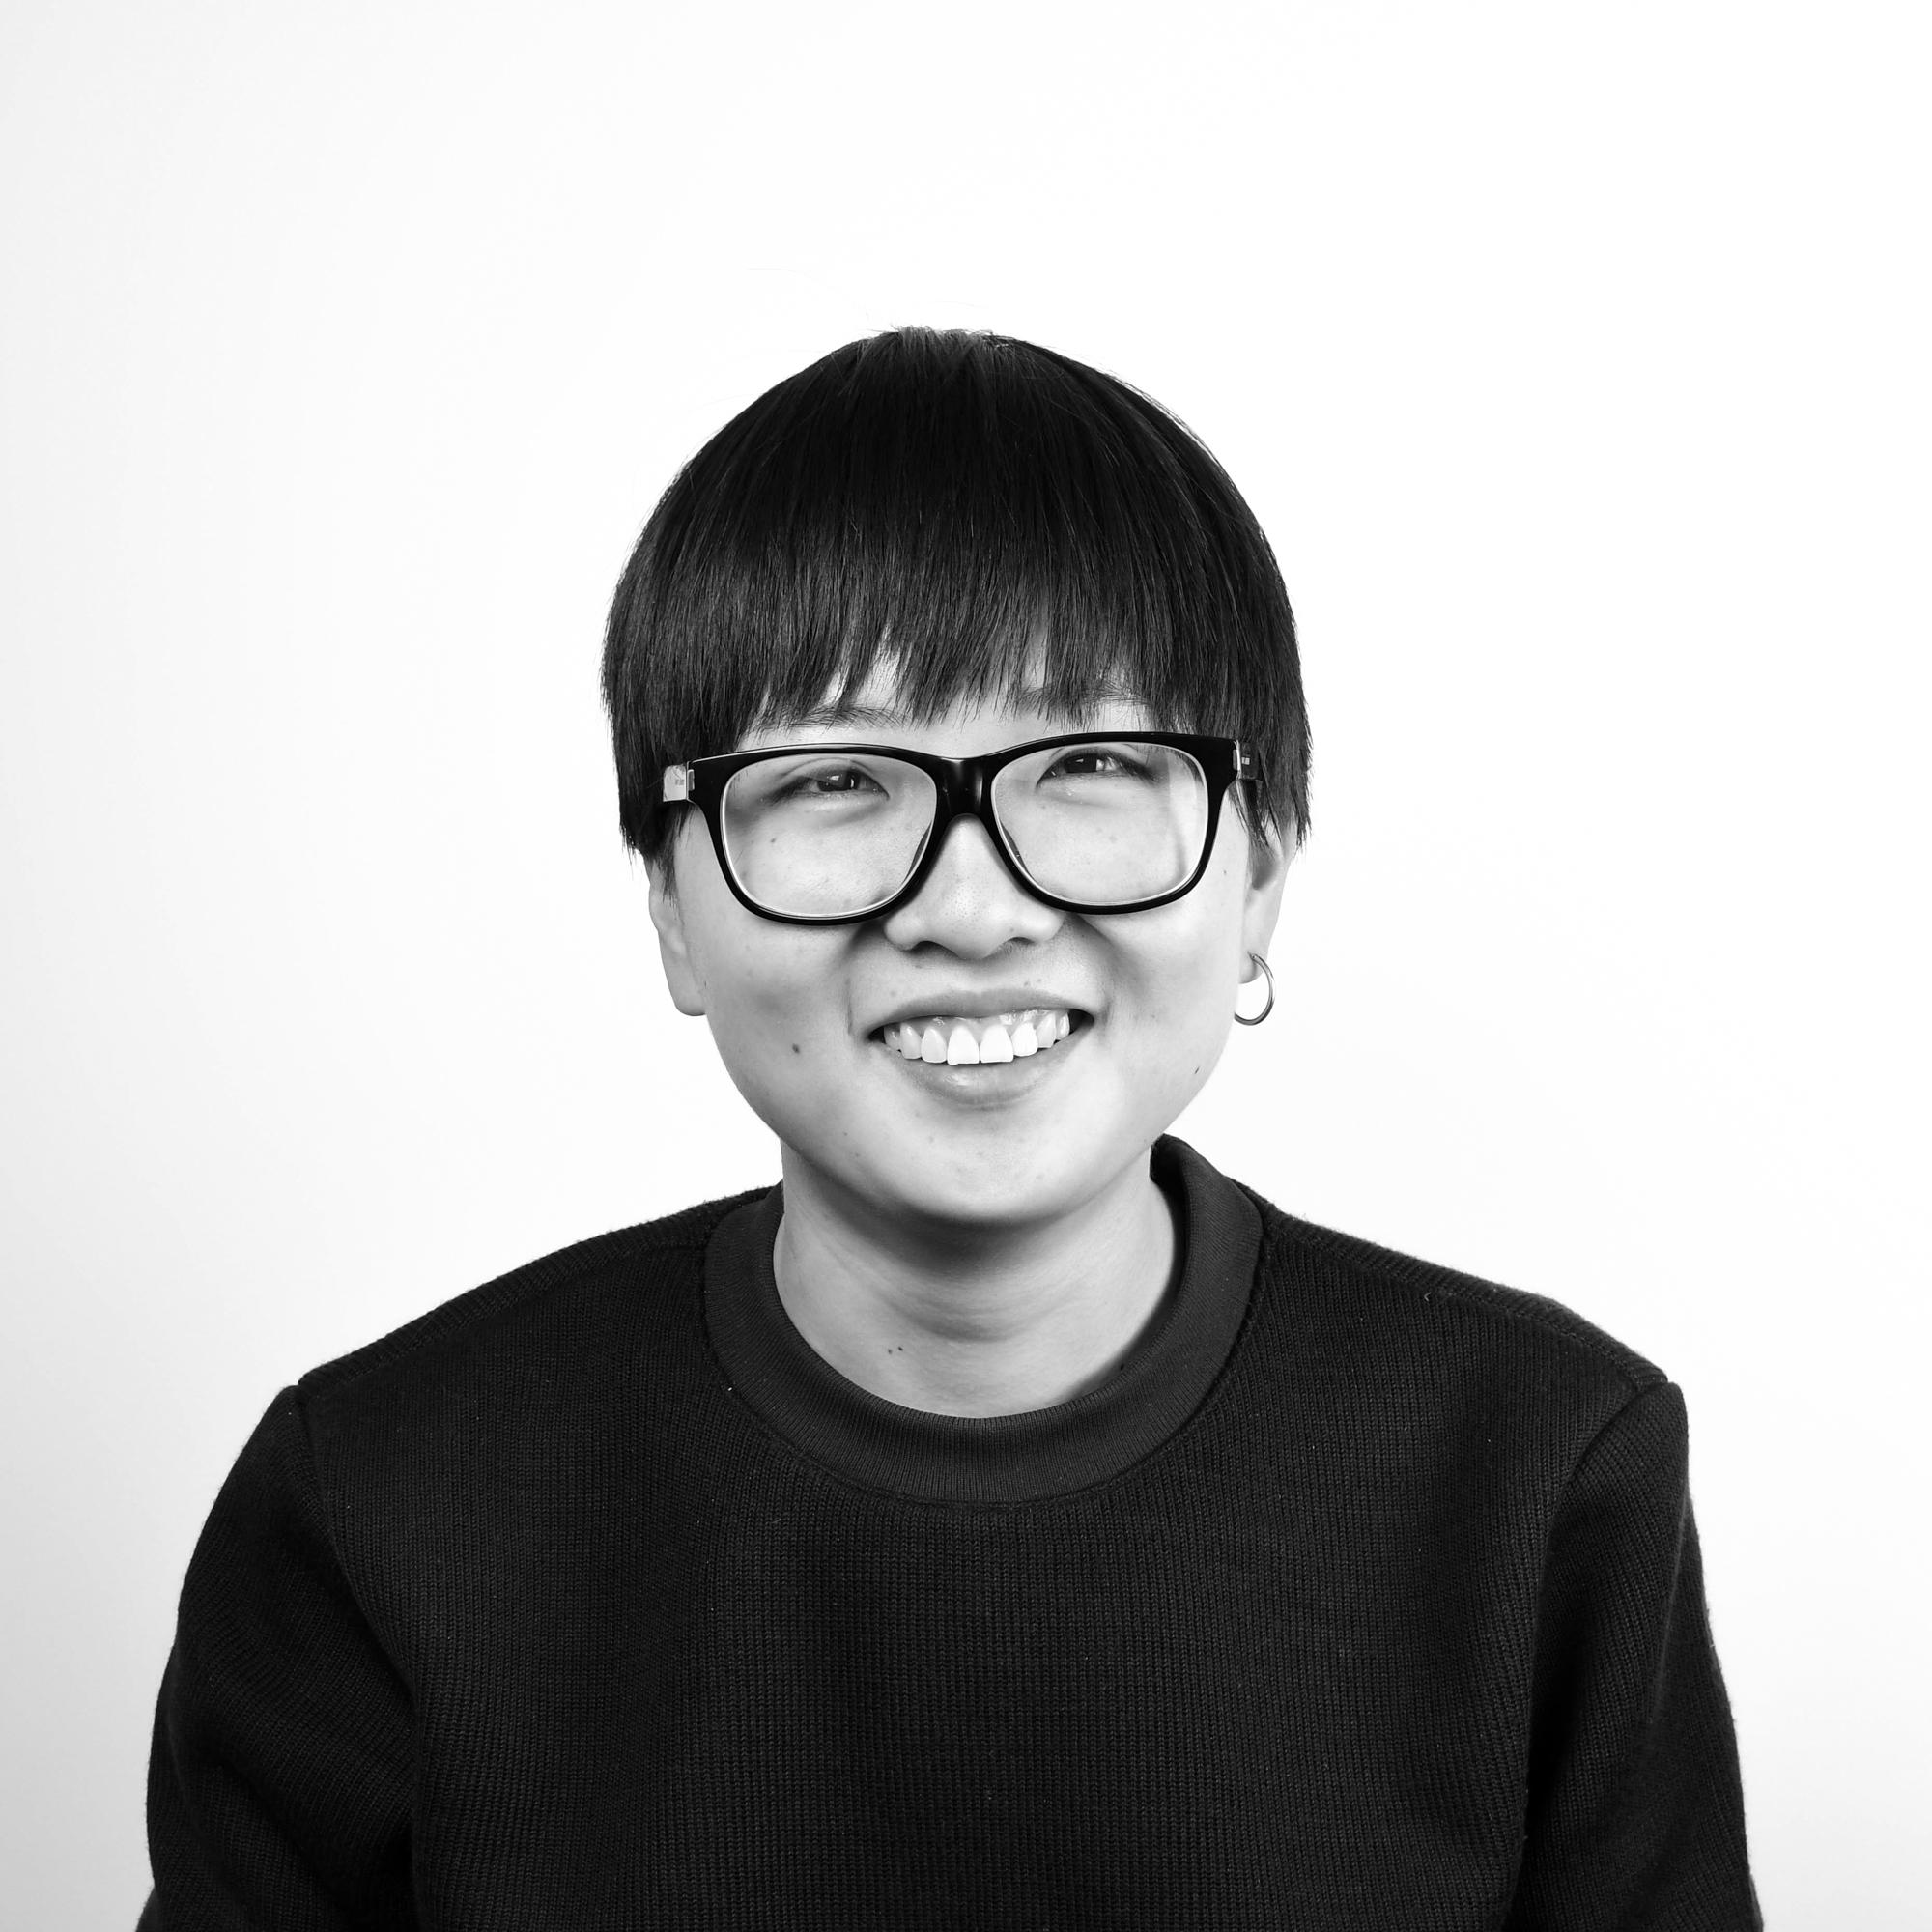 Zhizi Liu   Play more, design more.   fancyzhizi.com   kid.liuzz@gmail.com